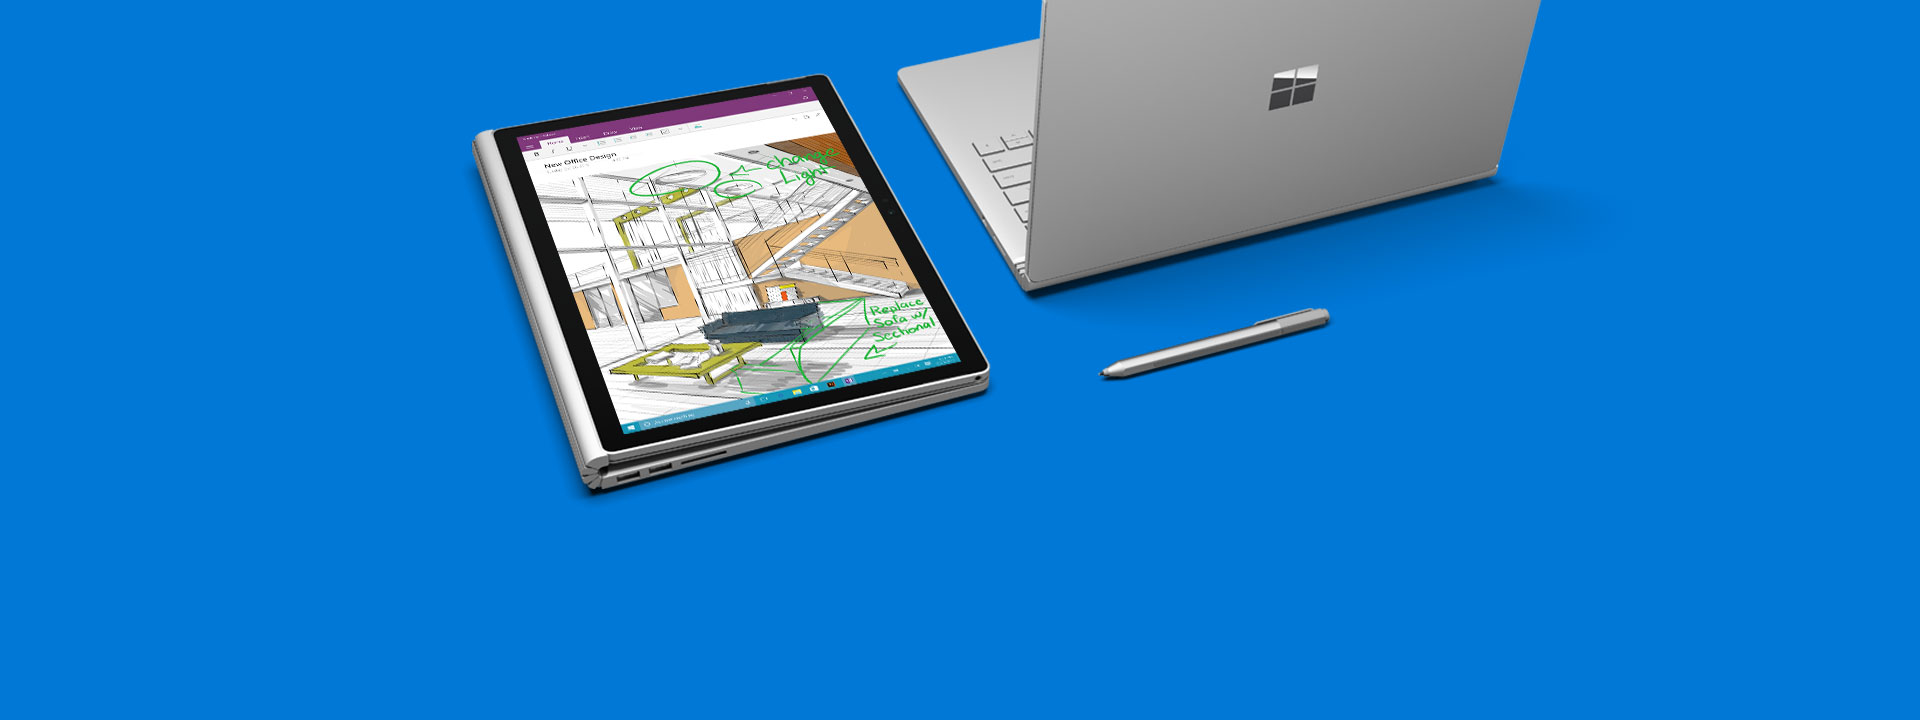 深入了解 Surface Book。